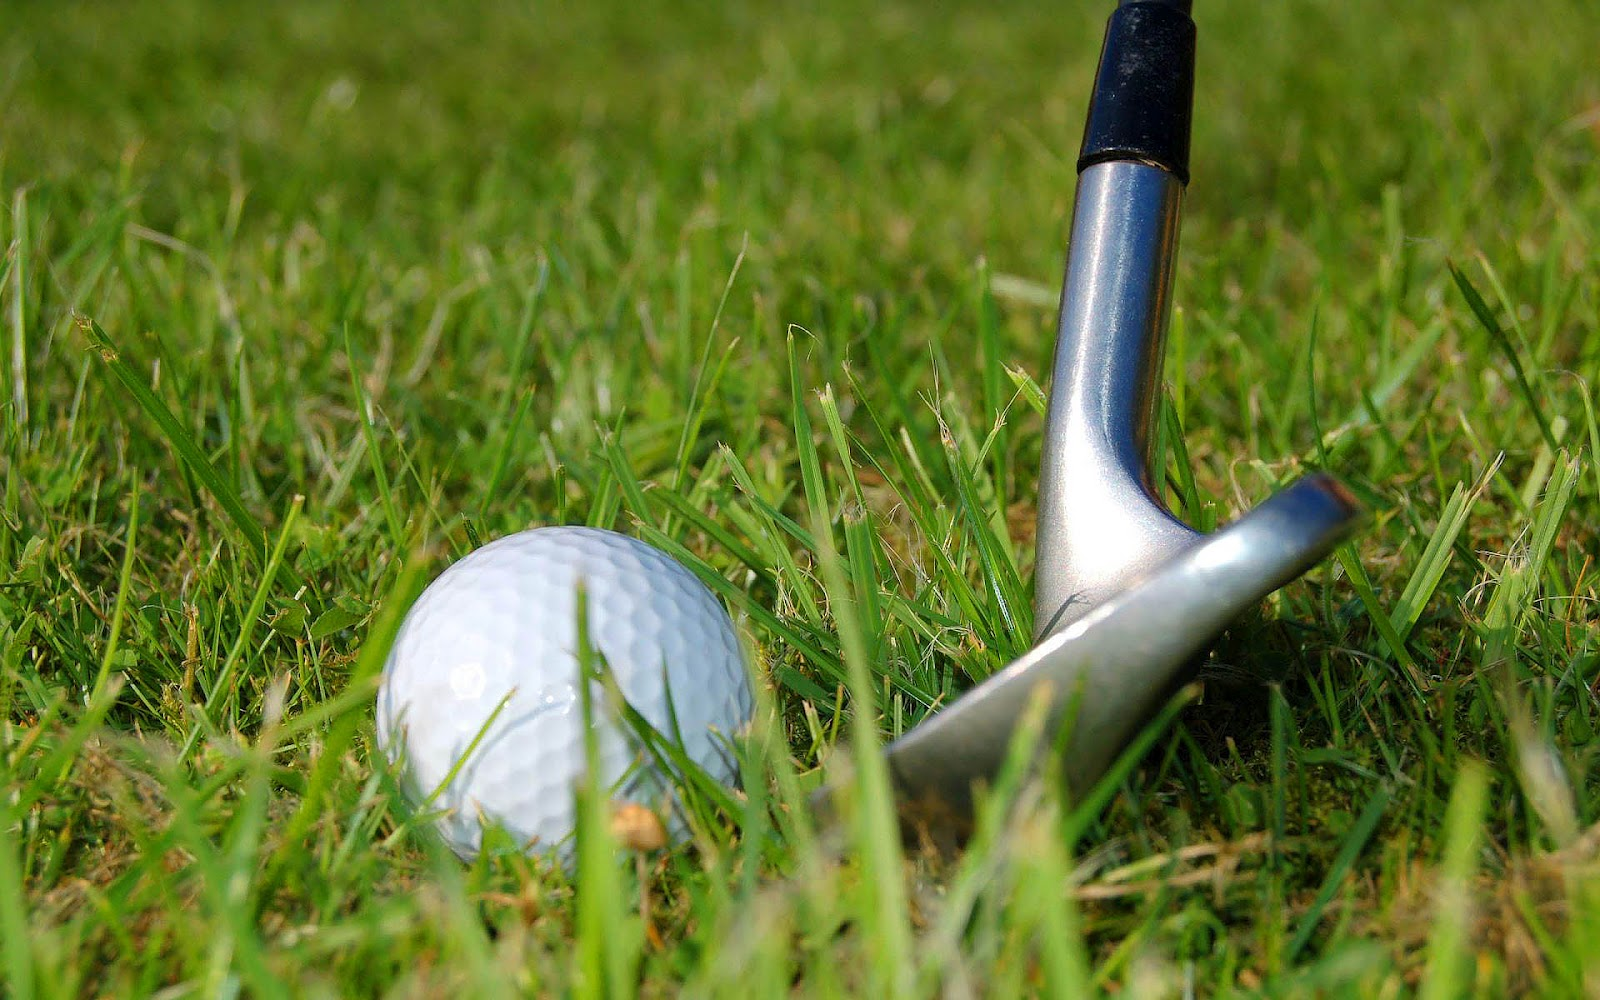 спорт sports гольф Golf  № 3310307 без смс